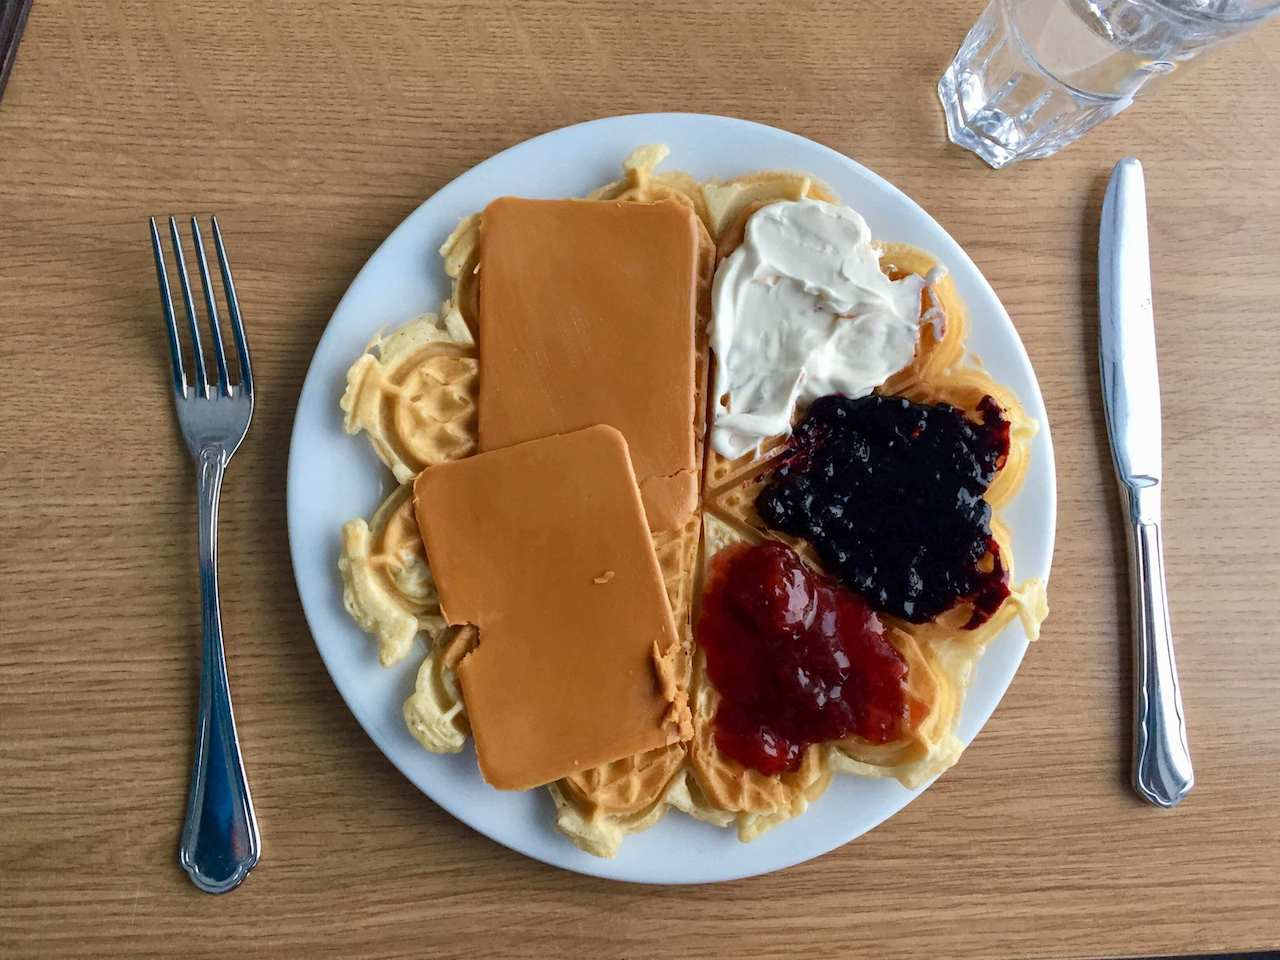 Norway, Fjellheisen - Waffles